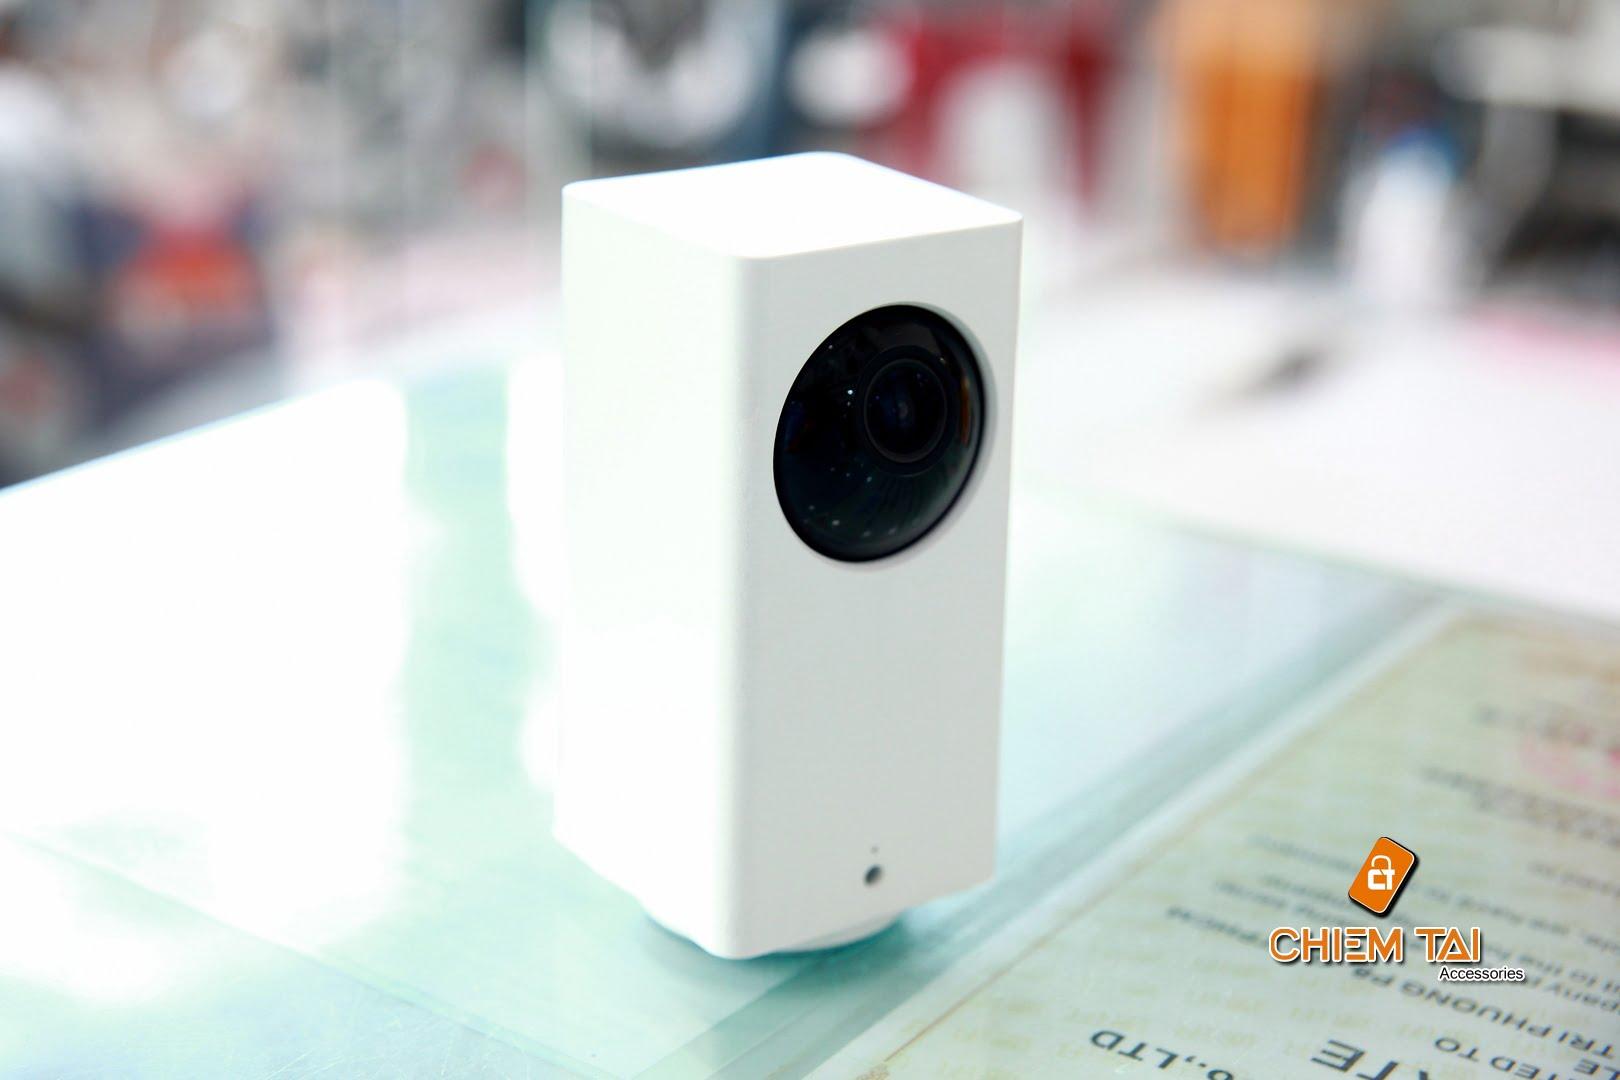 camera ip xiaomi xiaofang square ptz 360 full hd 1080p 6007d43ce8b2d